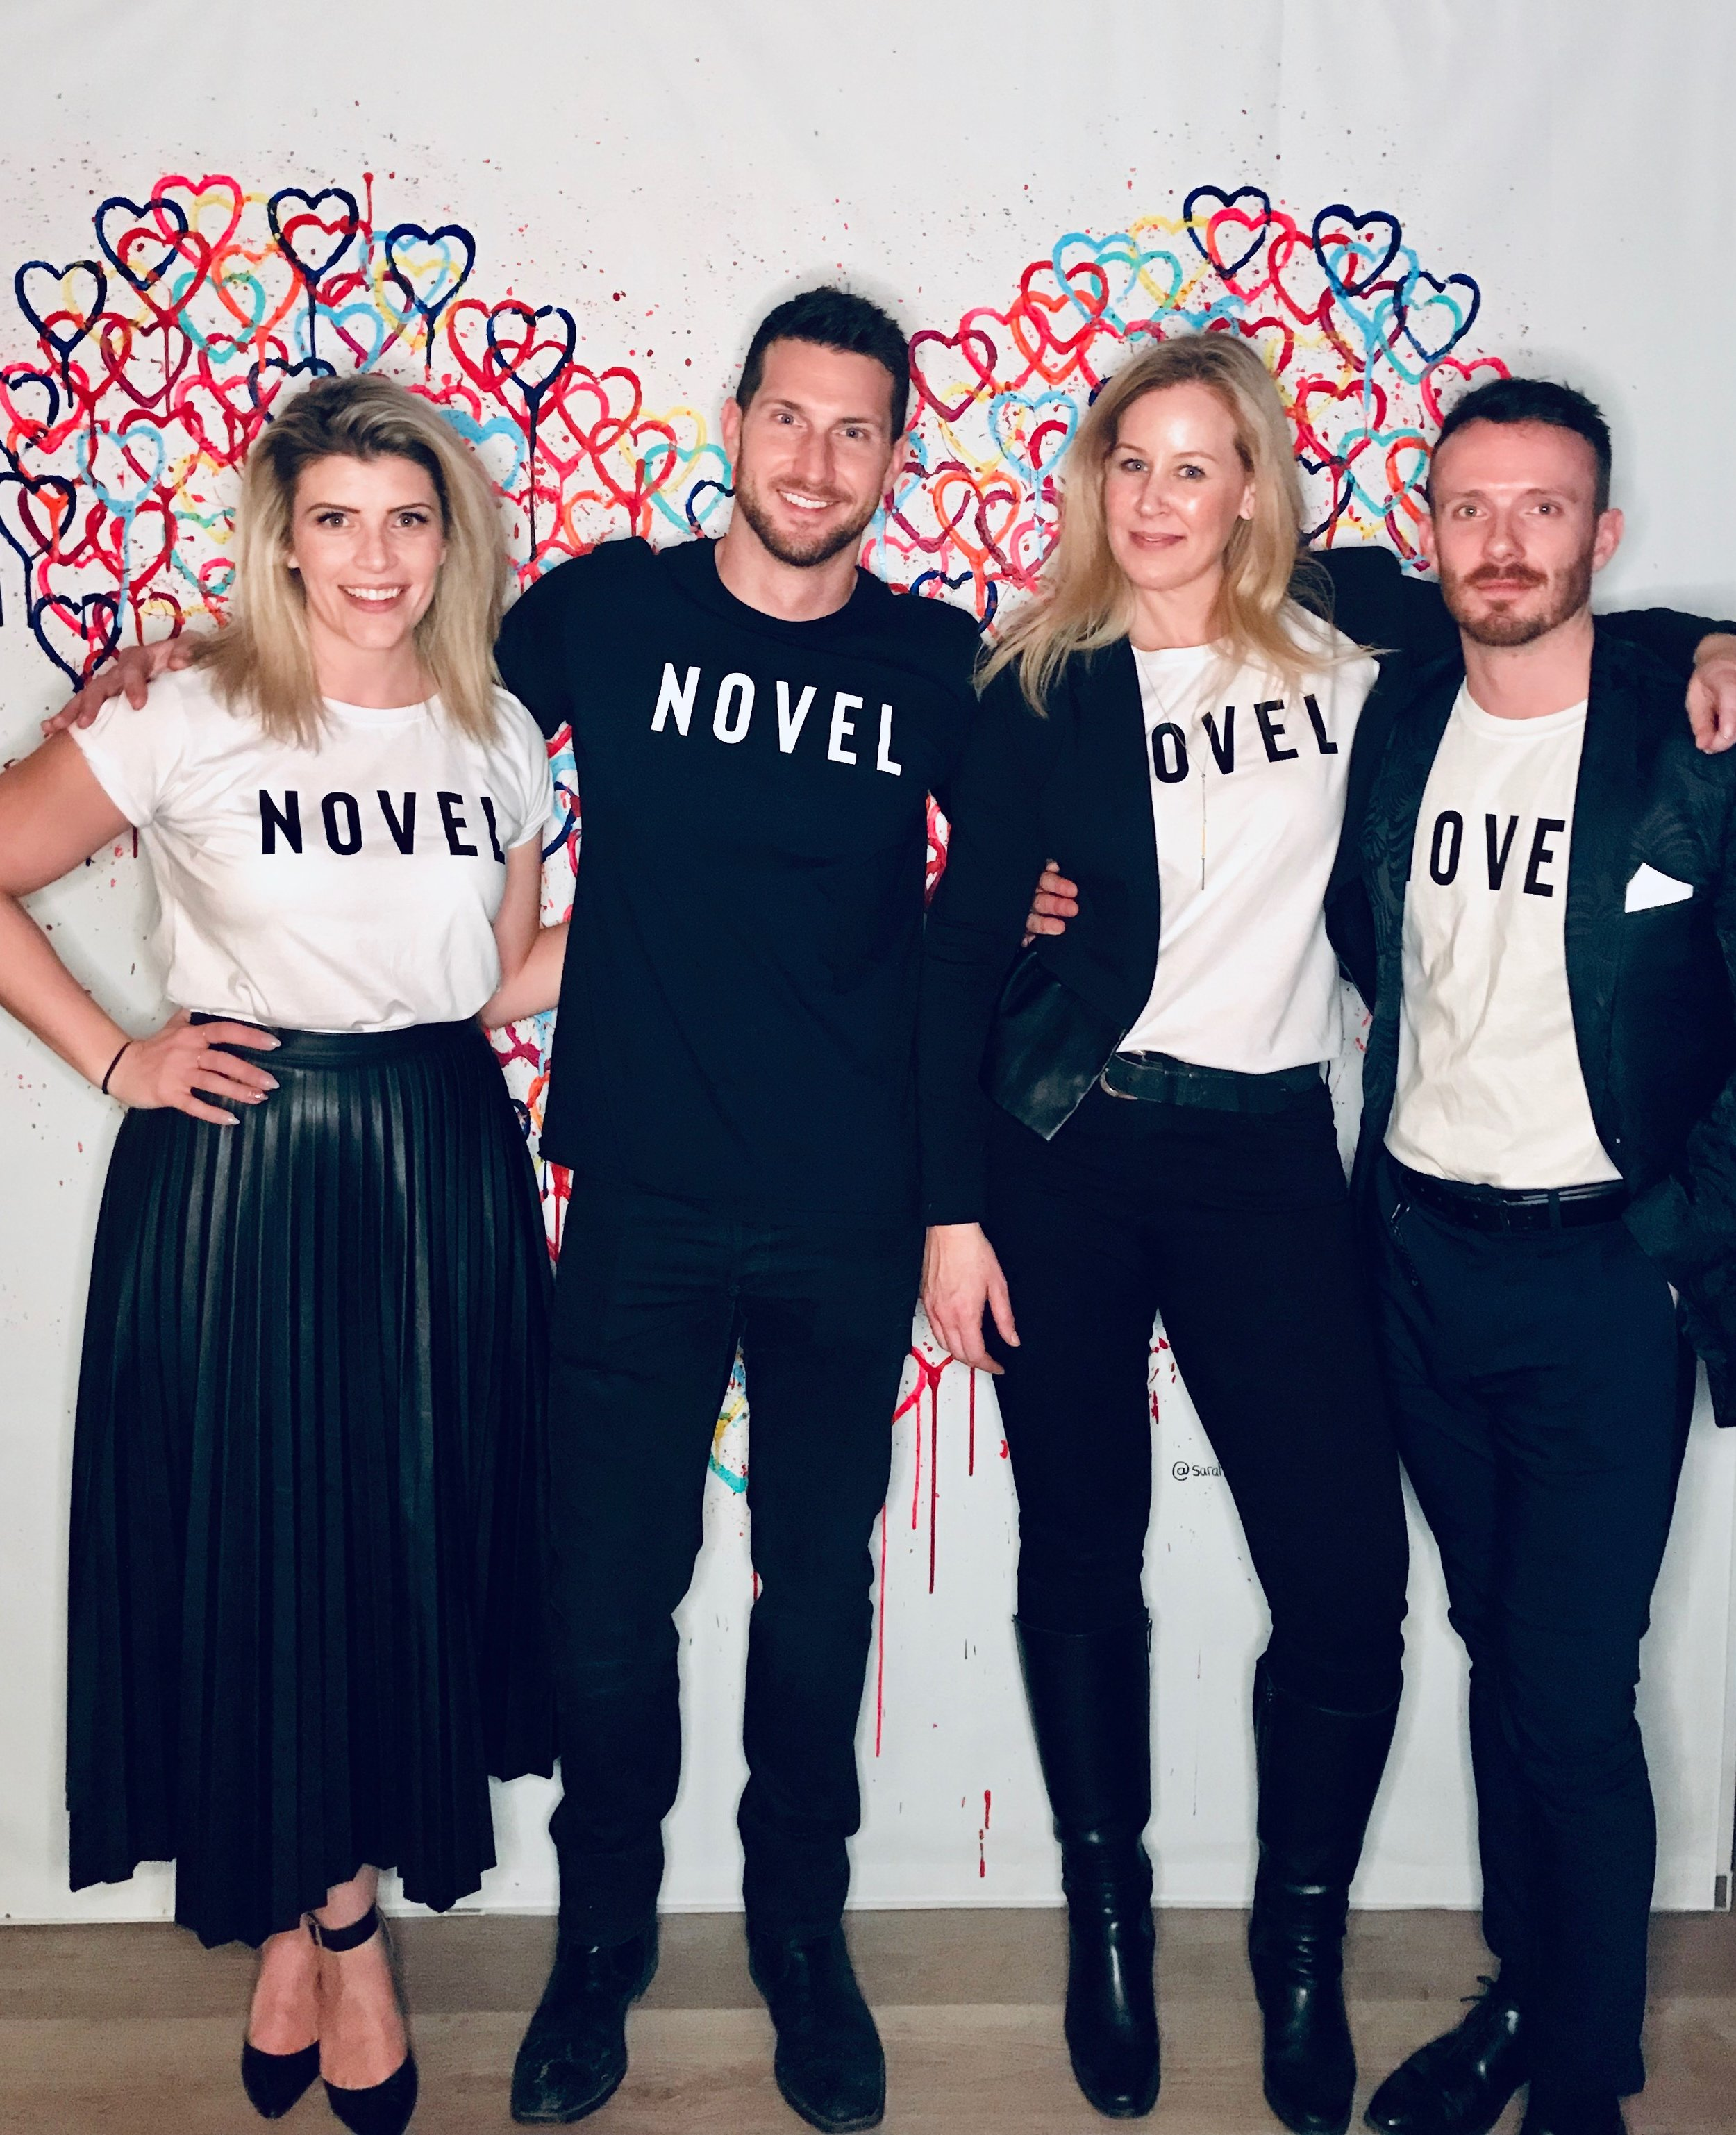 Novel Crew at Lavelle